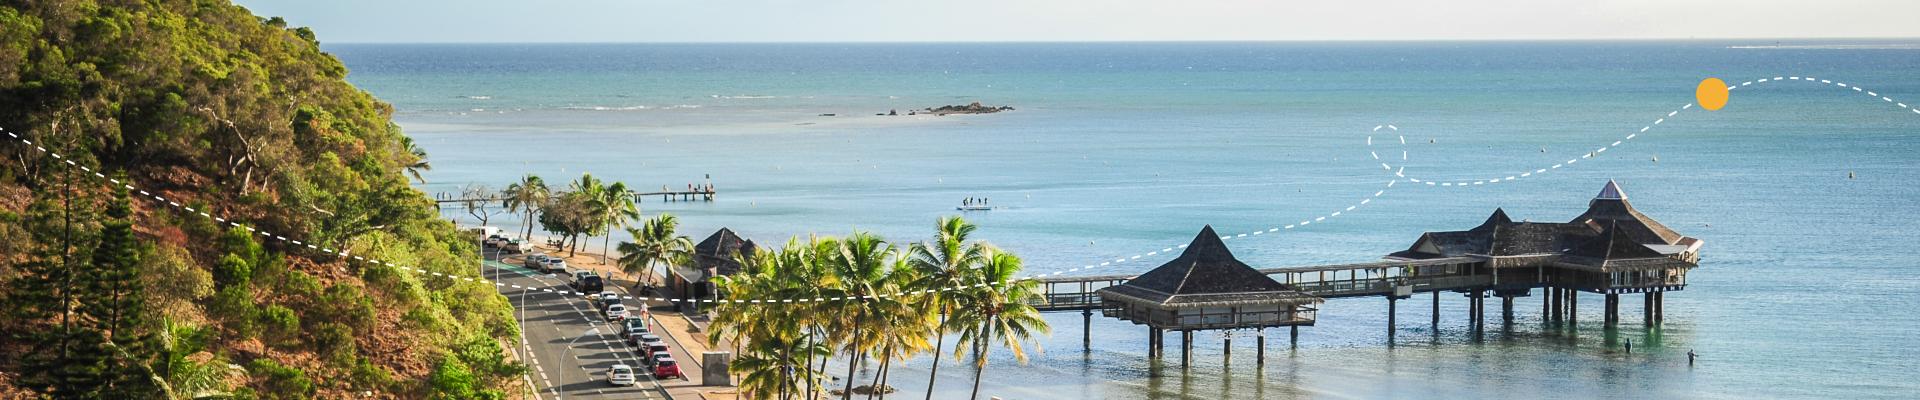 Descubriendo Noumea, Nueva Caledonia